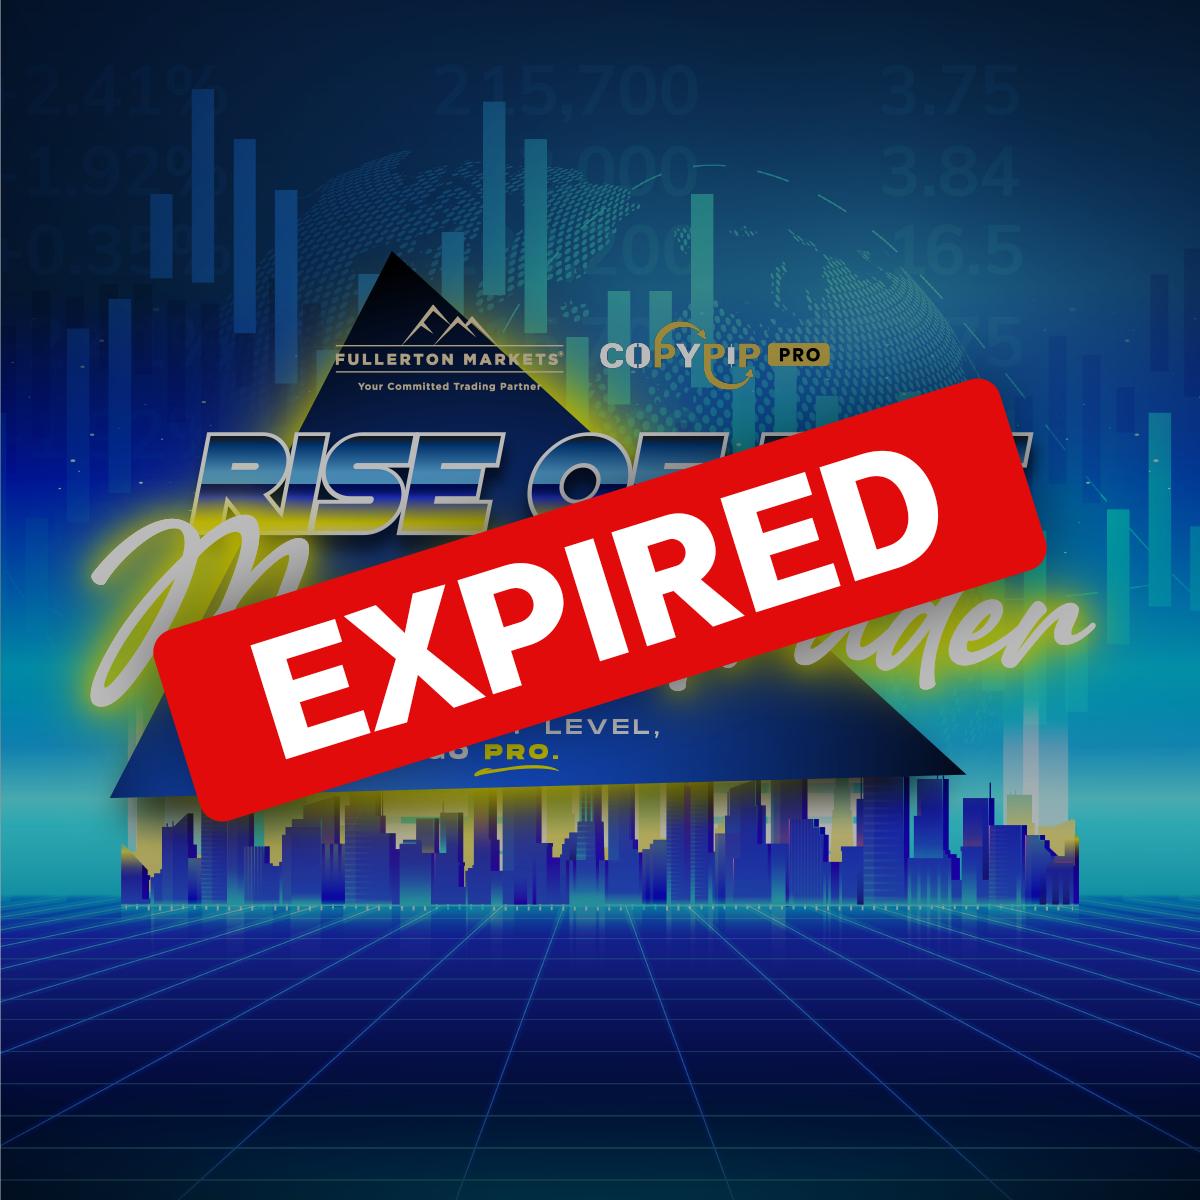 CopyPip-Pro-Trading-Contest_1200x1200px_en